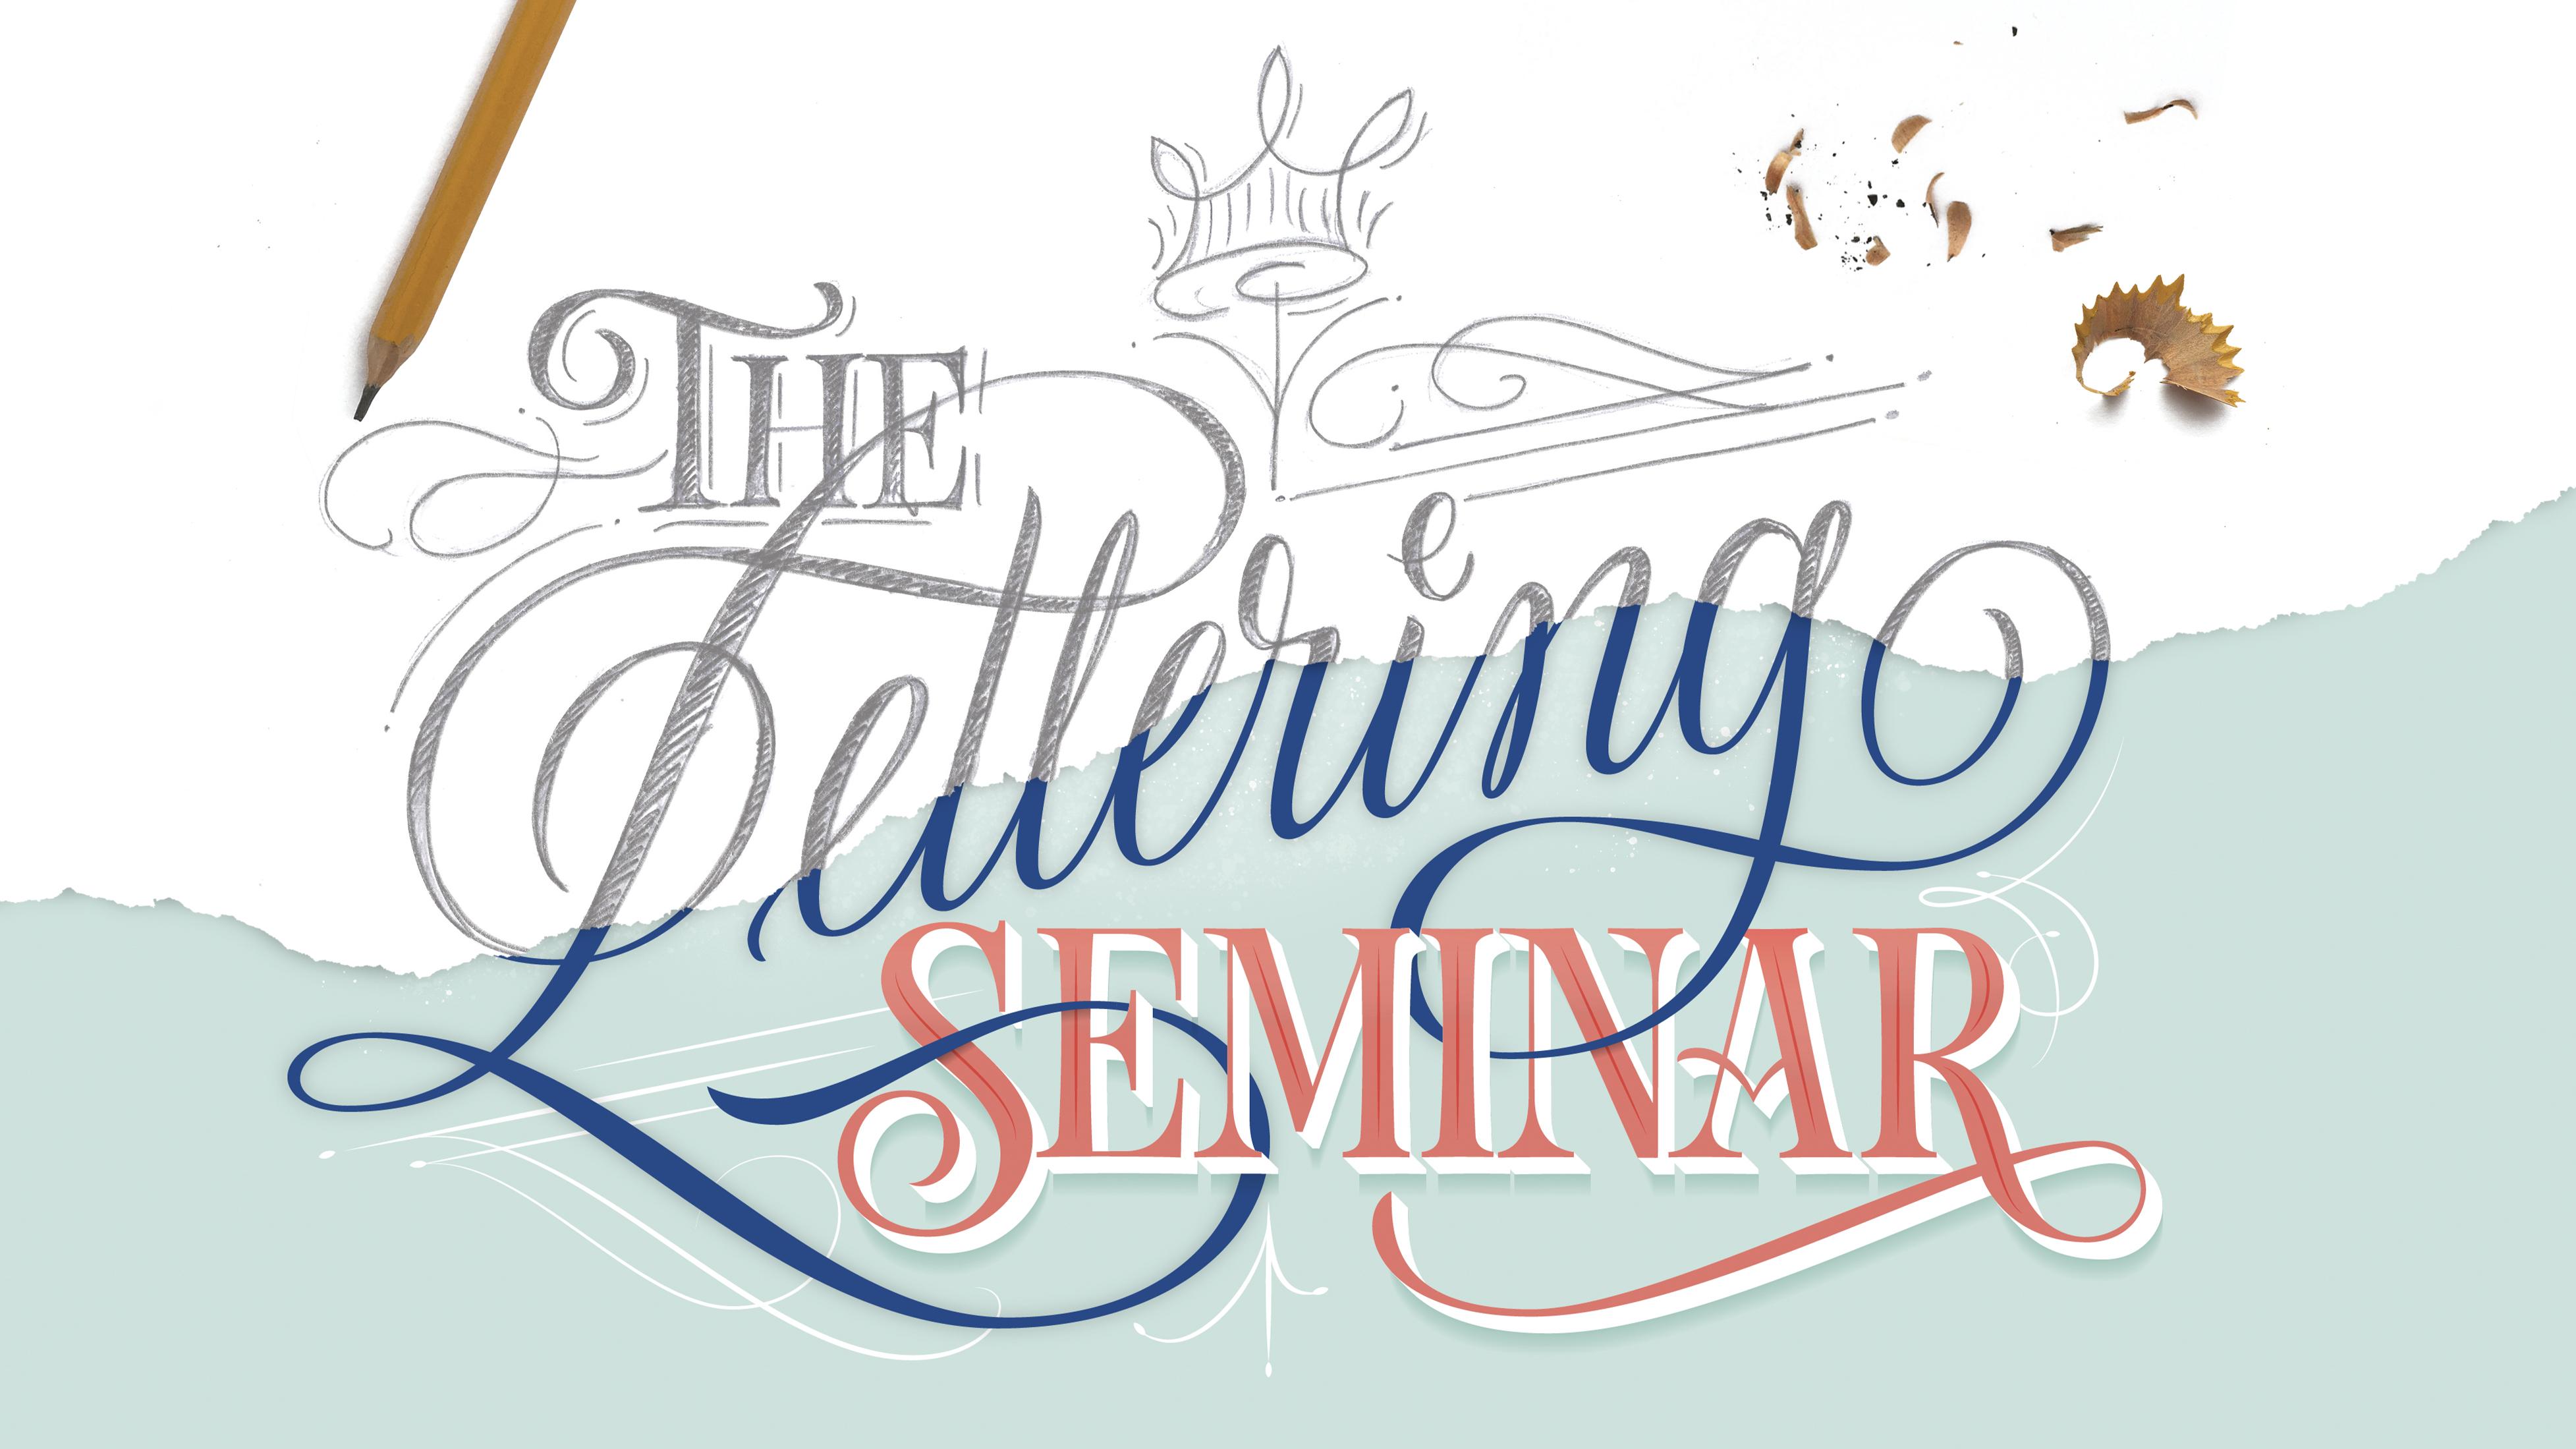 theletteringseminar the lettering seminar Martina flor summer online